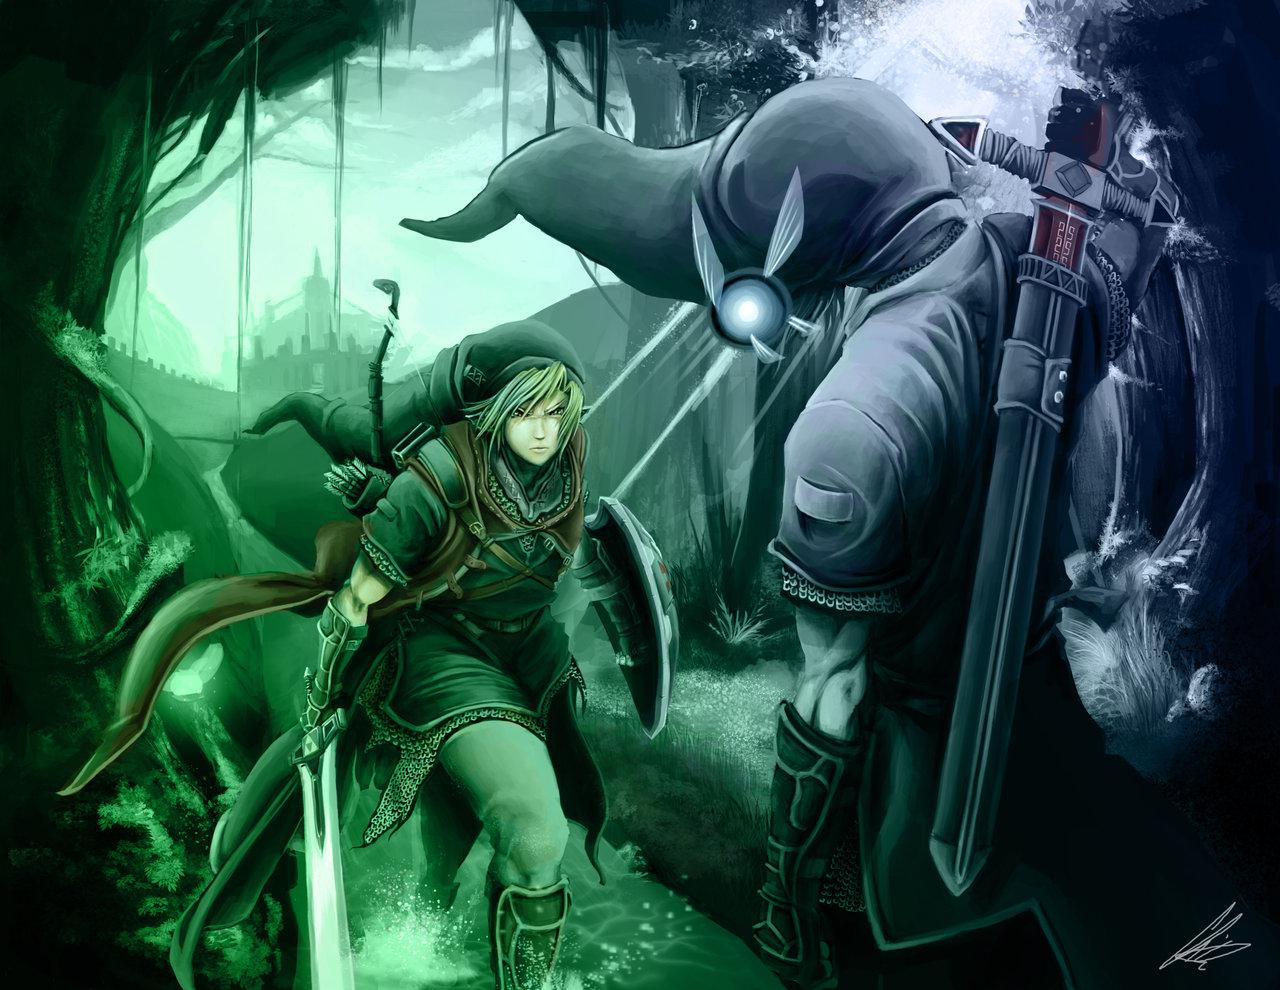 Link vs Dark Link by RazerChris 1280x990